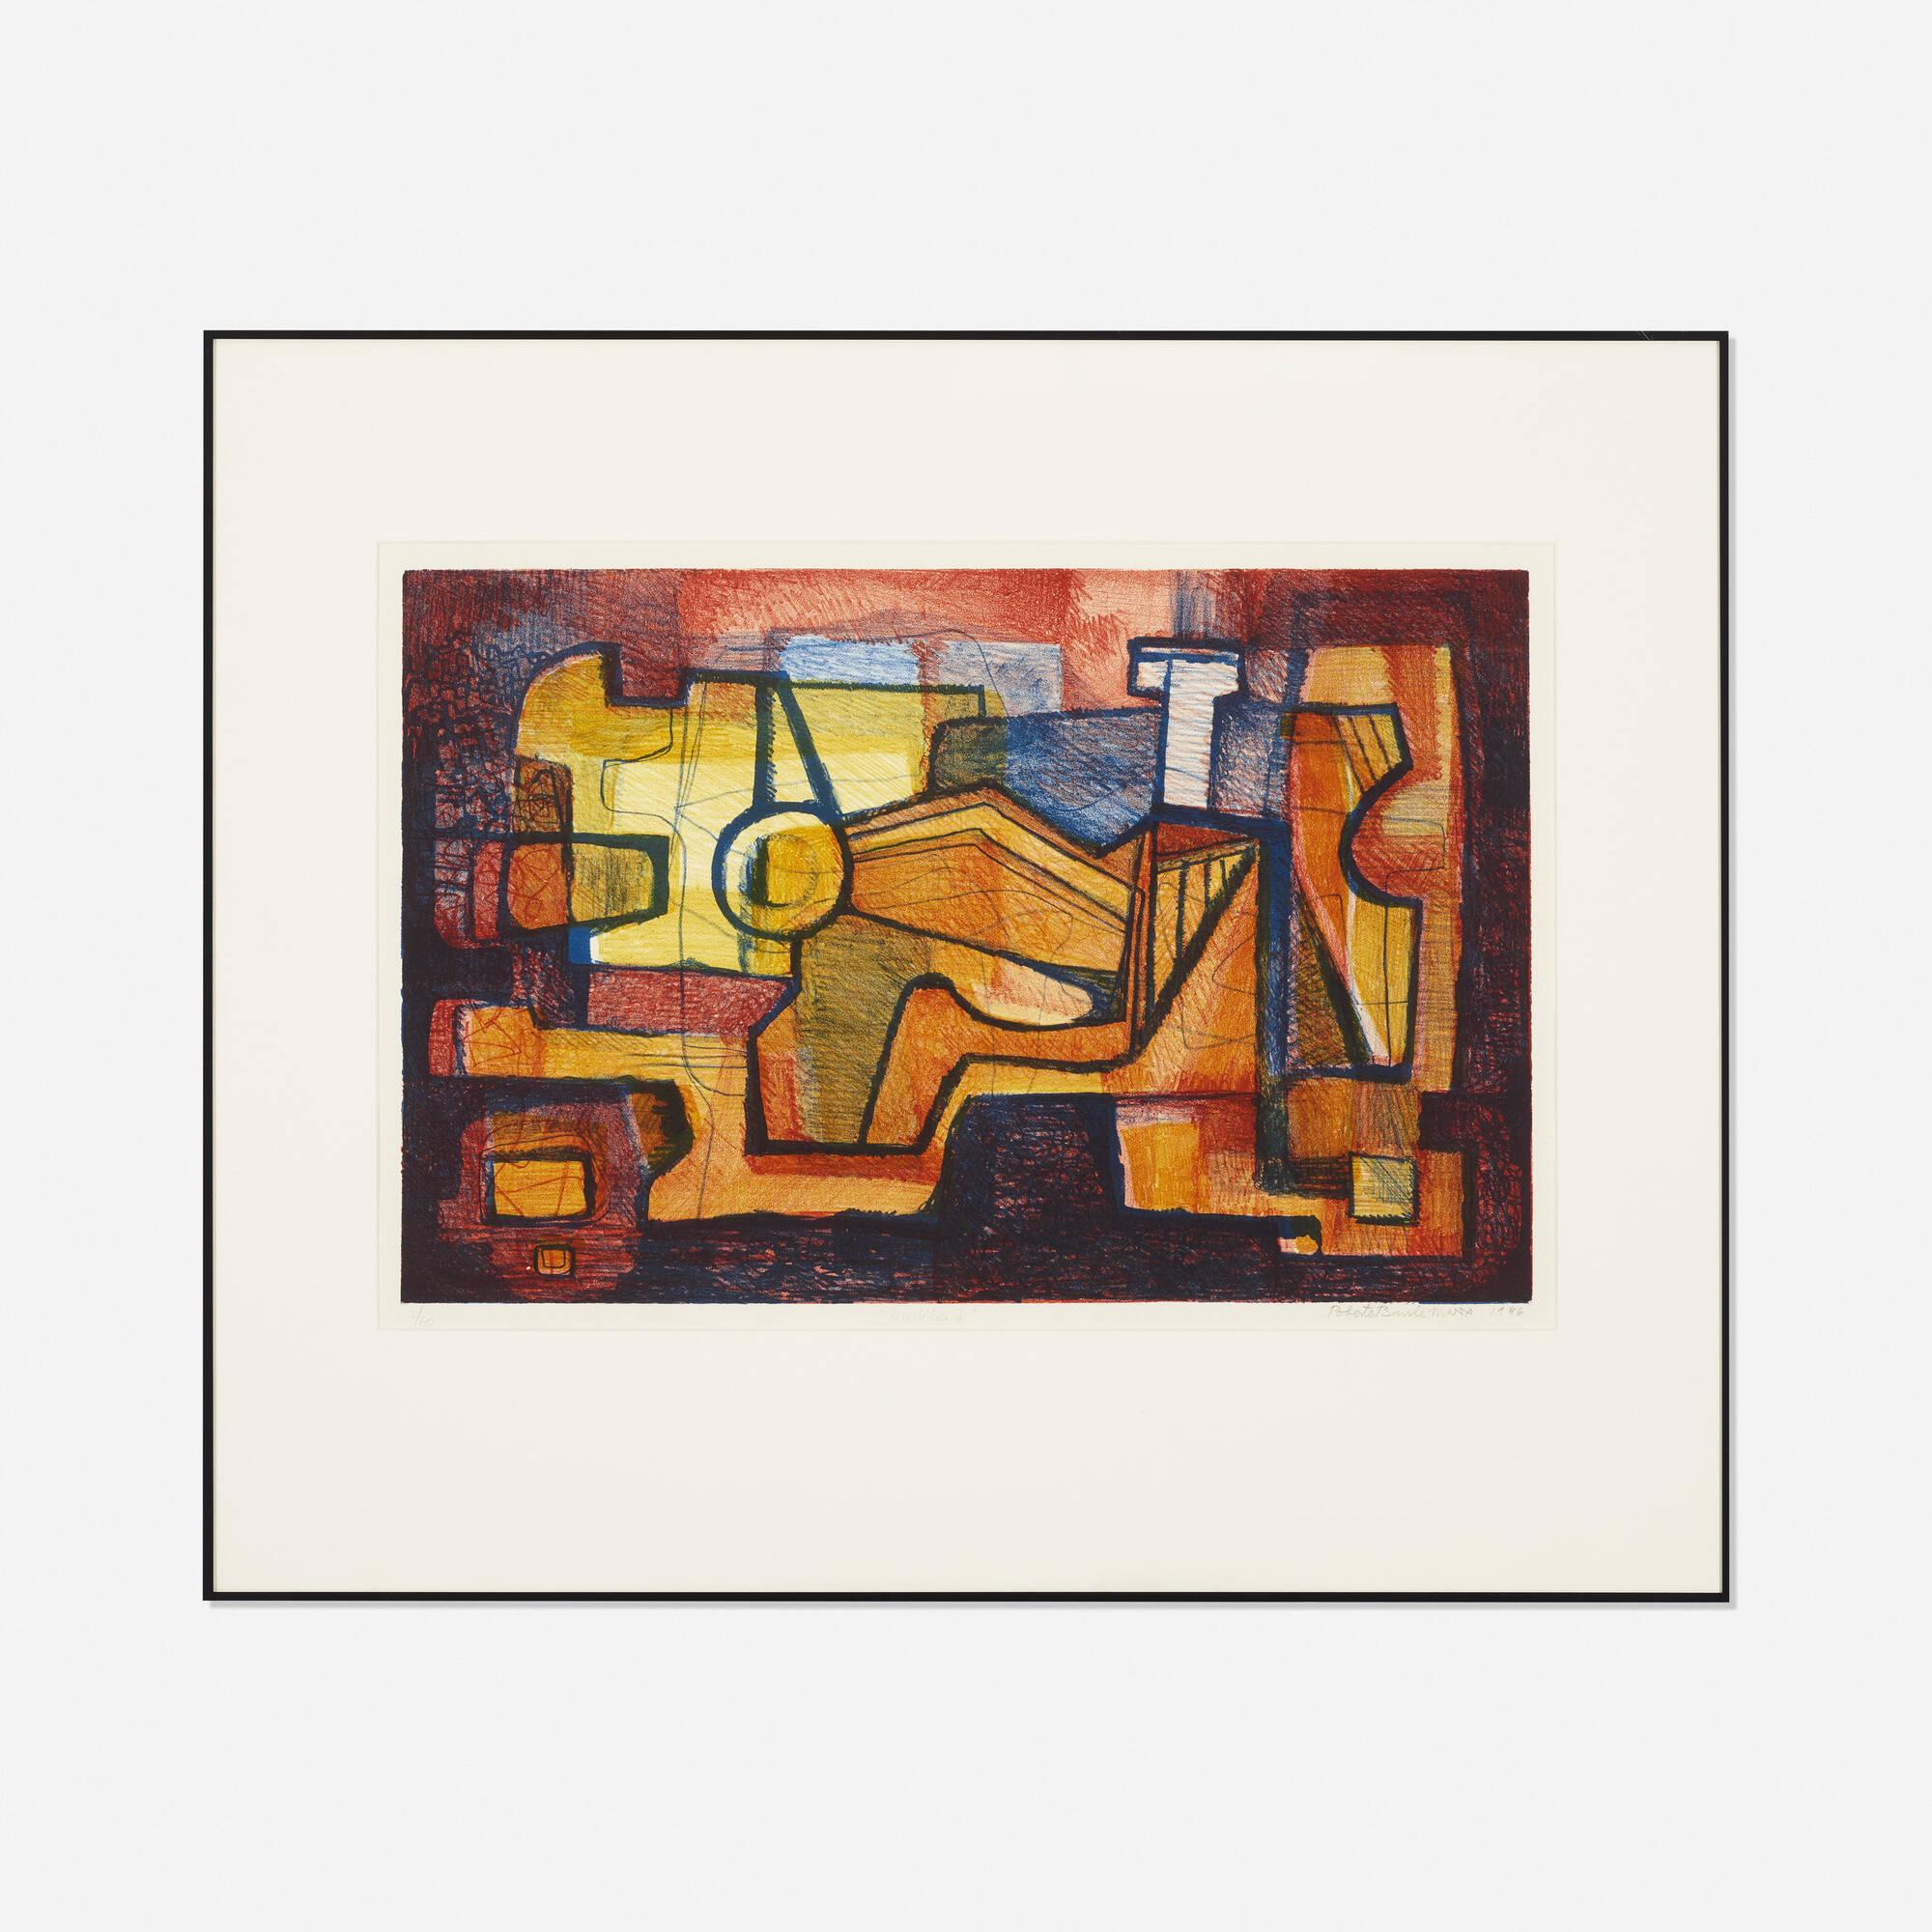 218: Roberto Burle Marx / Mistelia I (1 of 1)